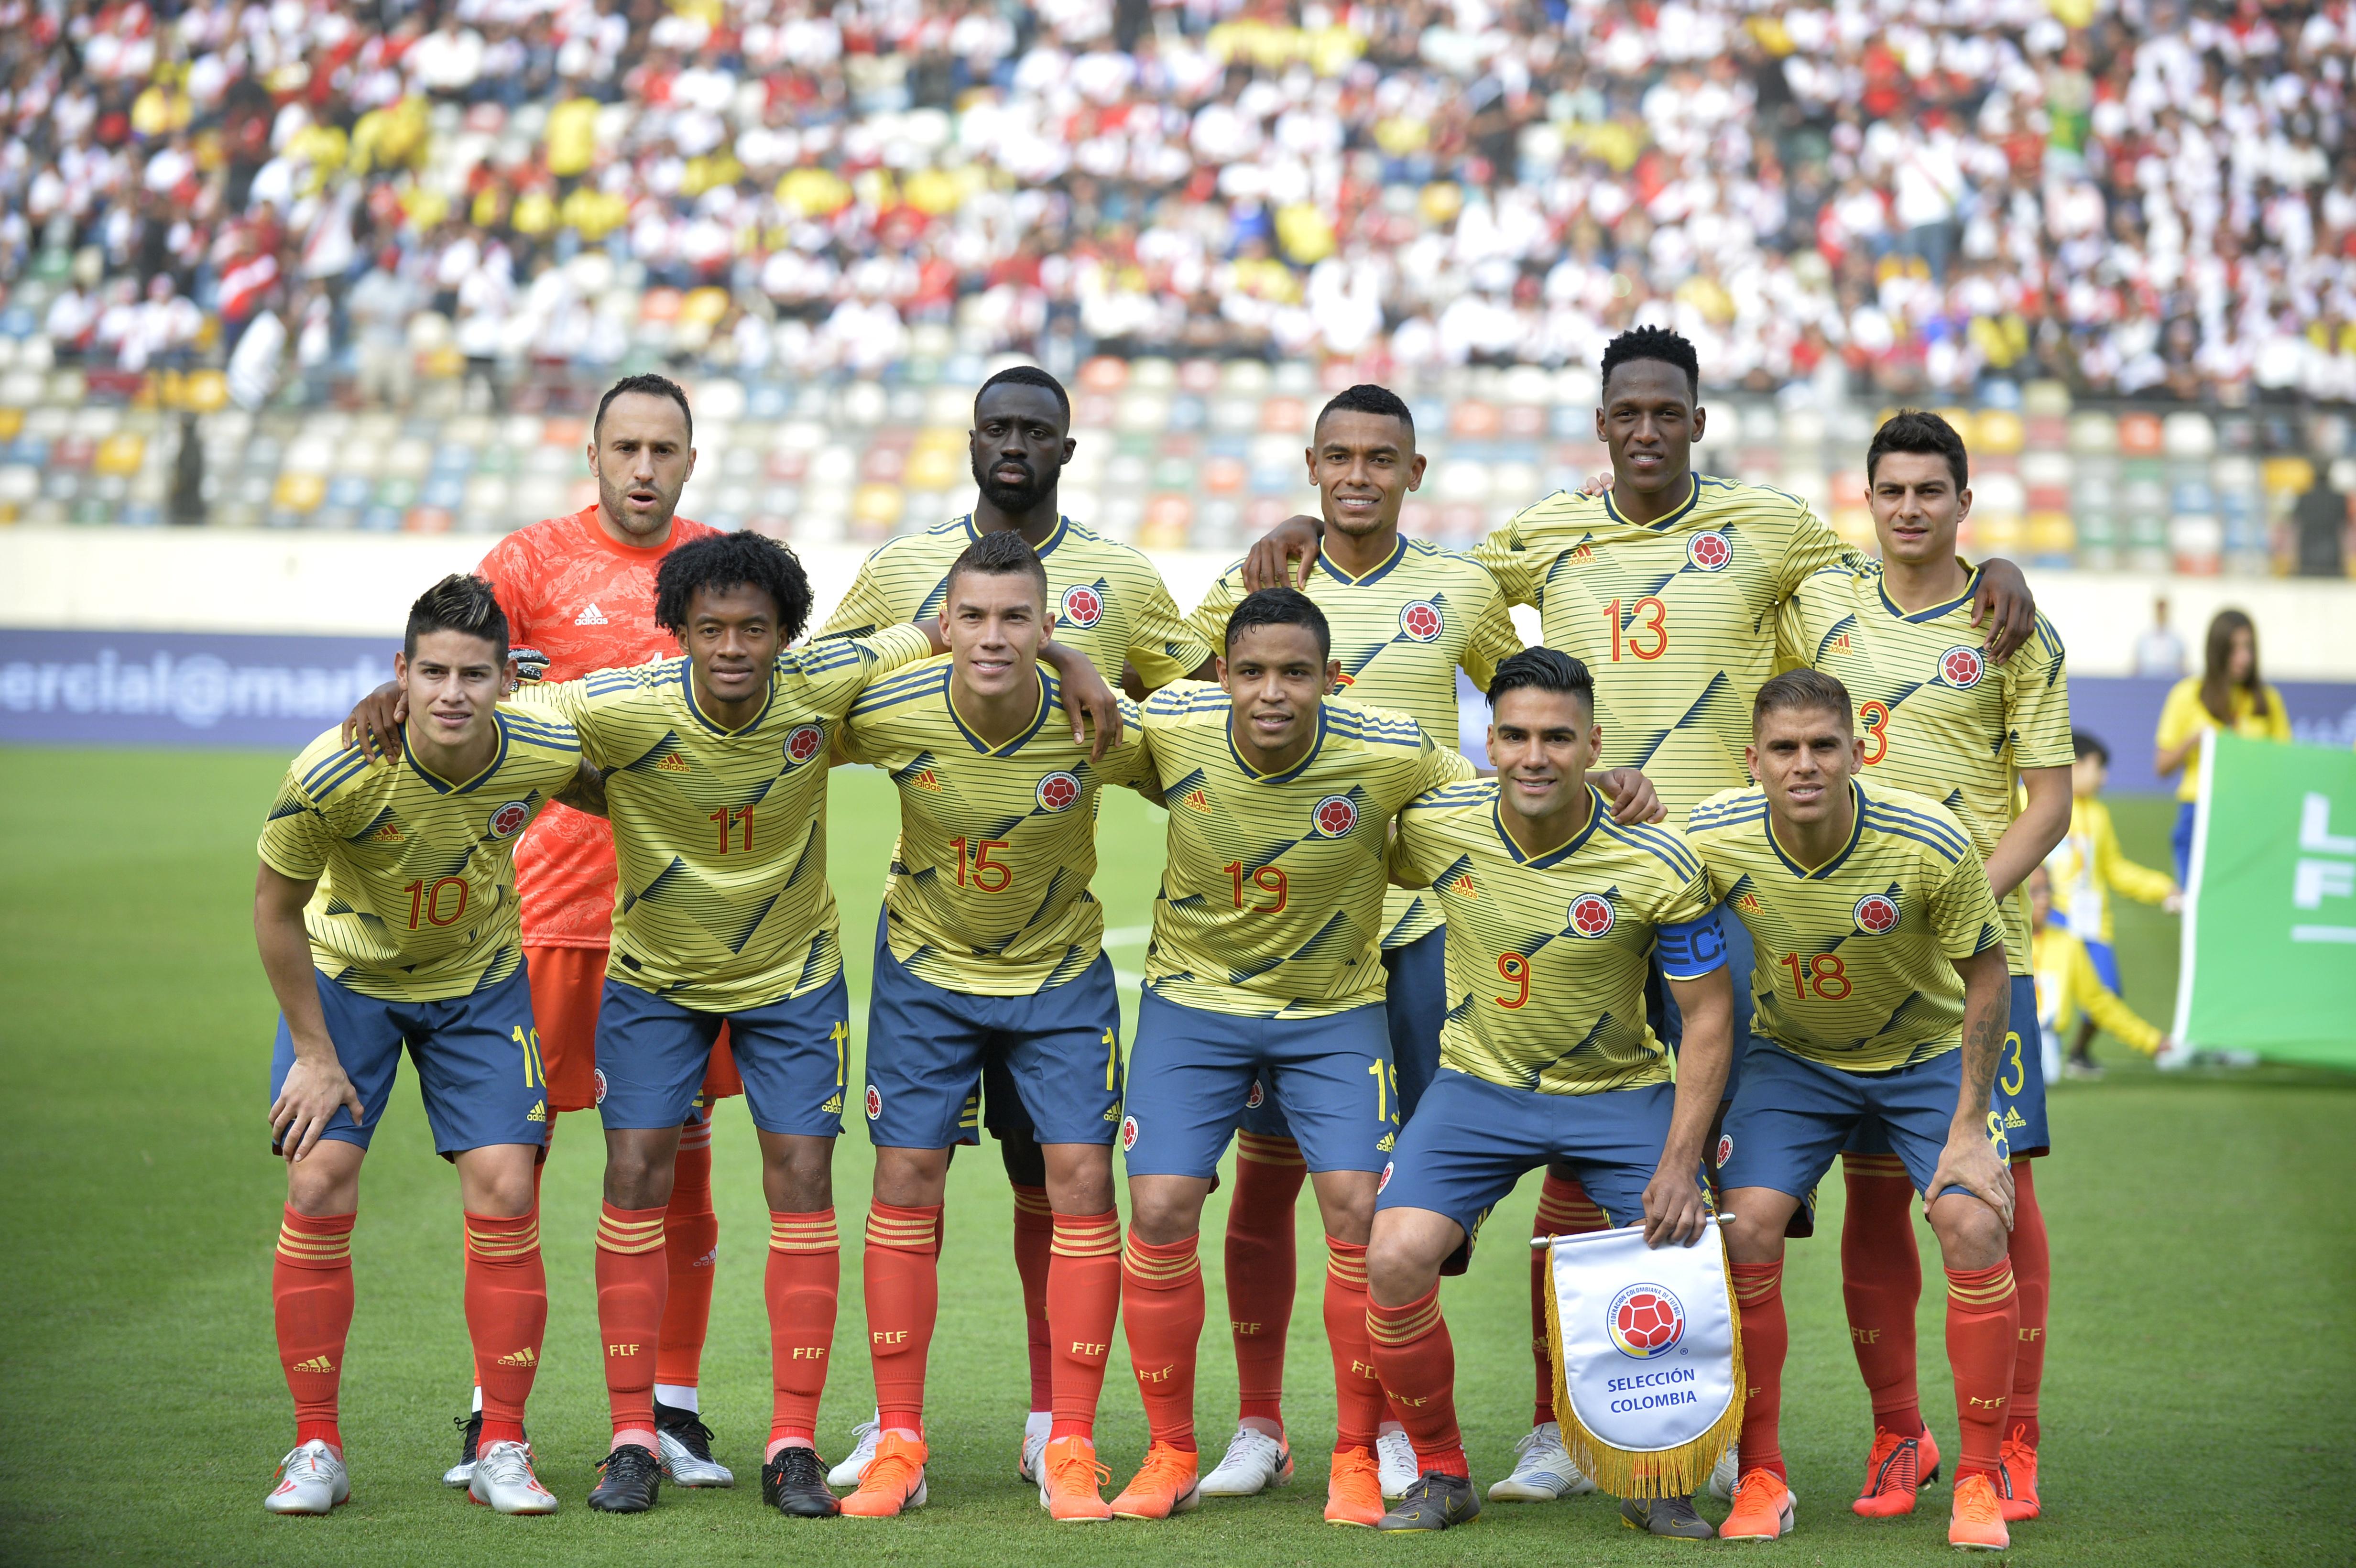 tecnicos-candidatos-a-la-seleccion-colombia-2020-Pinto-Bolillo-Suarez-Osorio-Pekerman-catar-2022